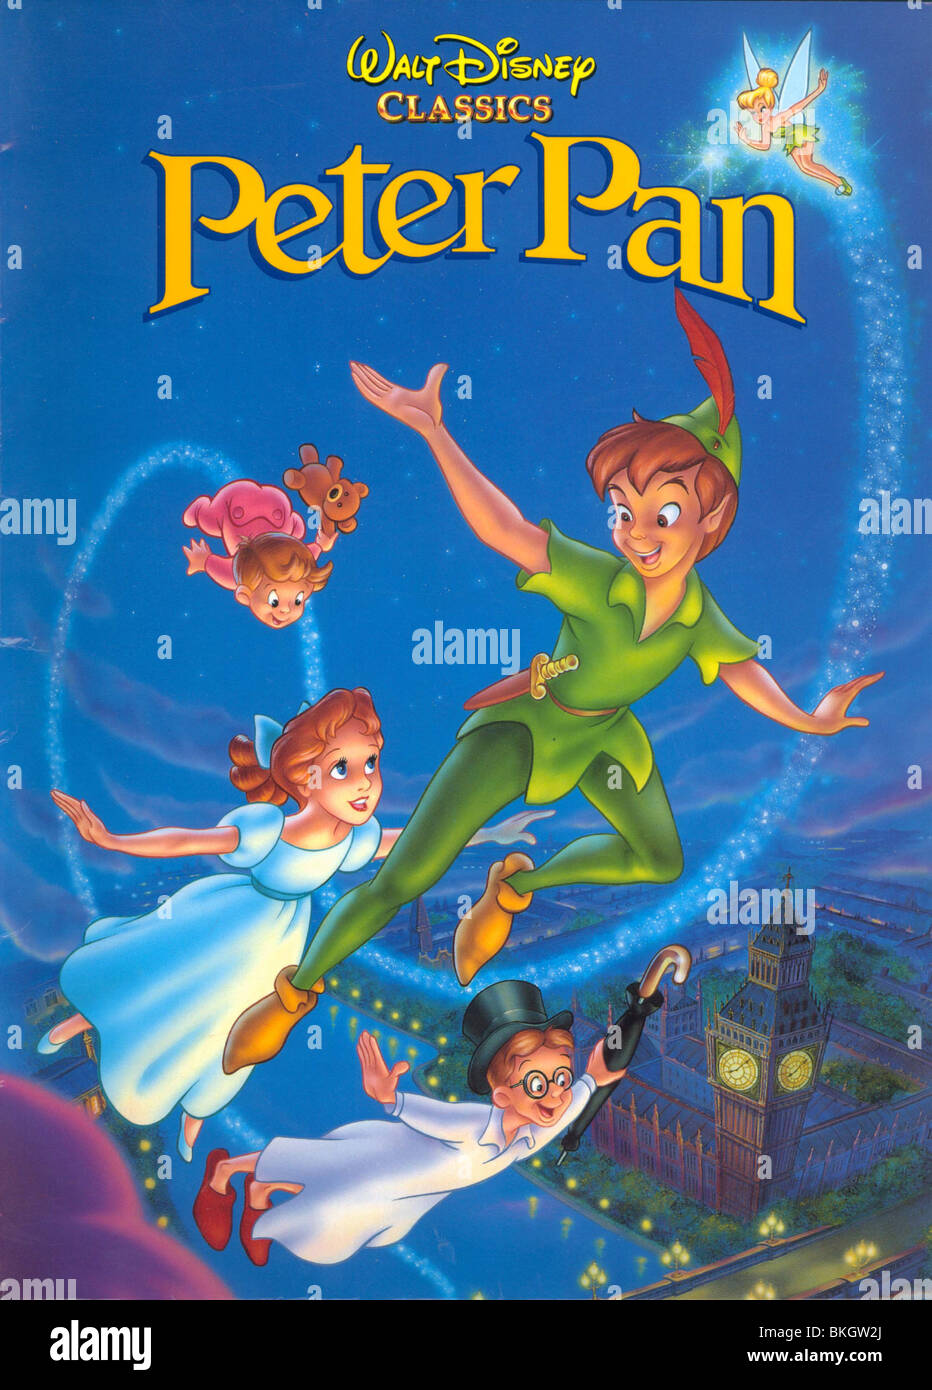 Peter Pan 1953 Animation Credit Disney Ptp 001pp Stockfoto Bild